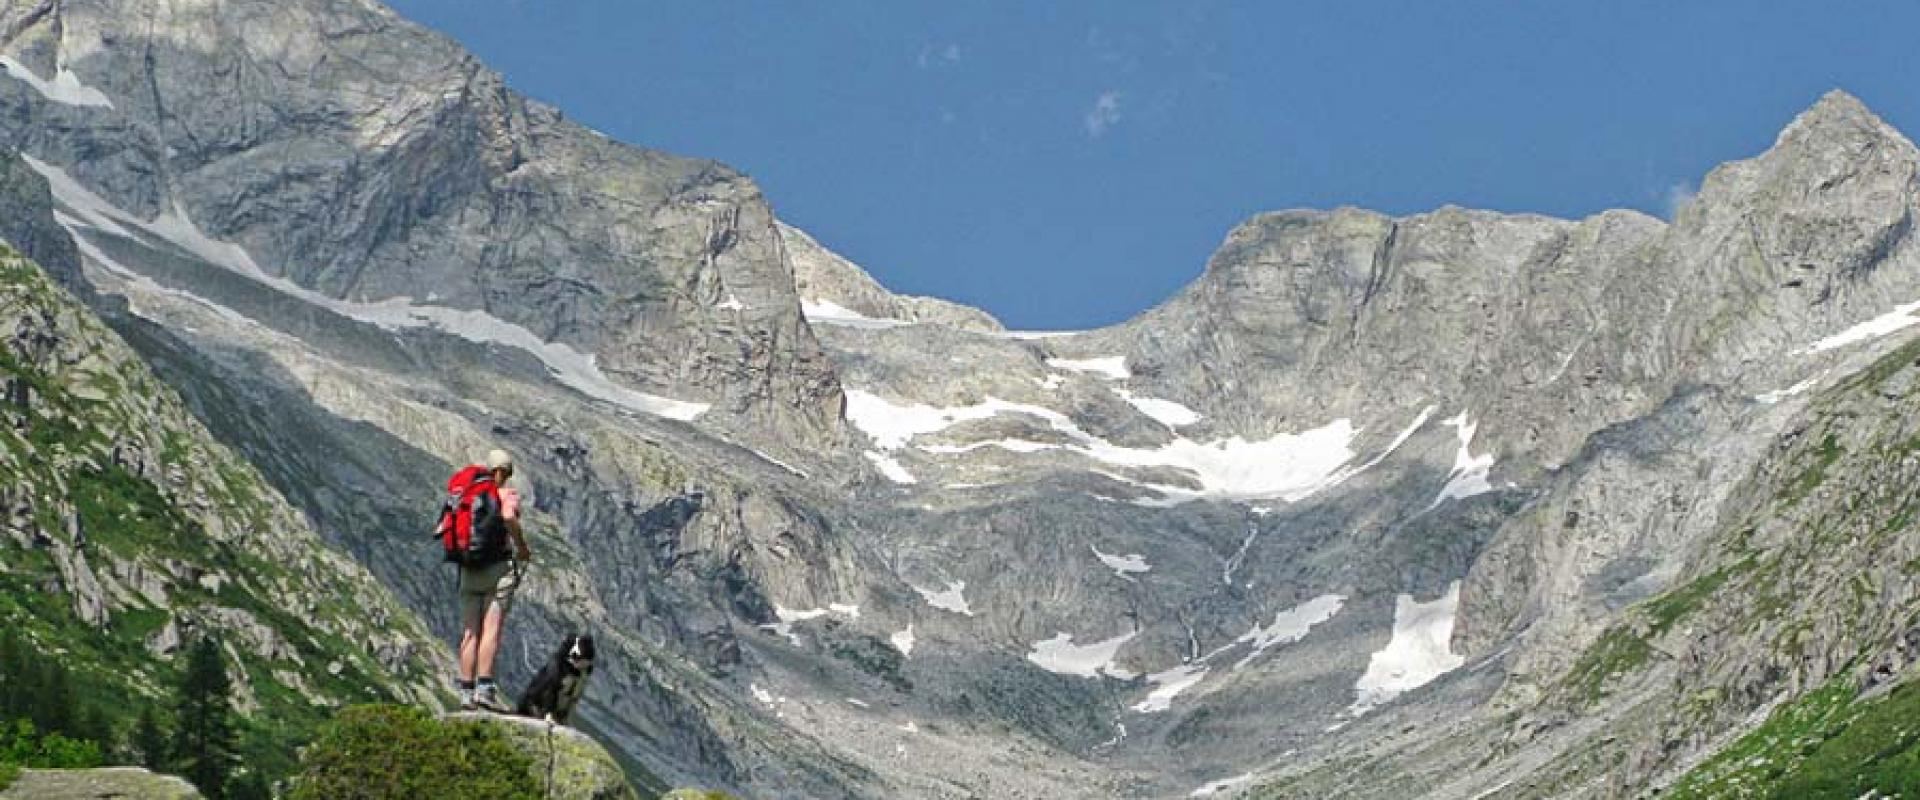 Trekking in Val Genova